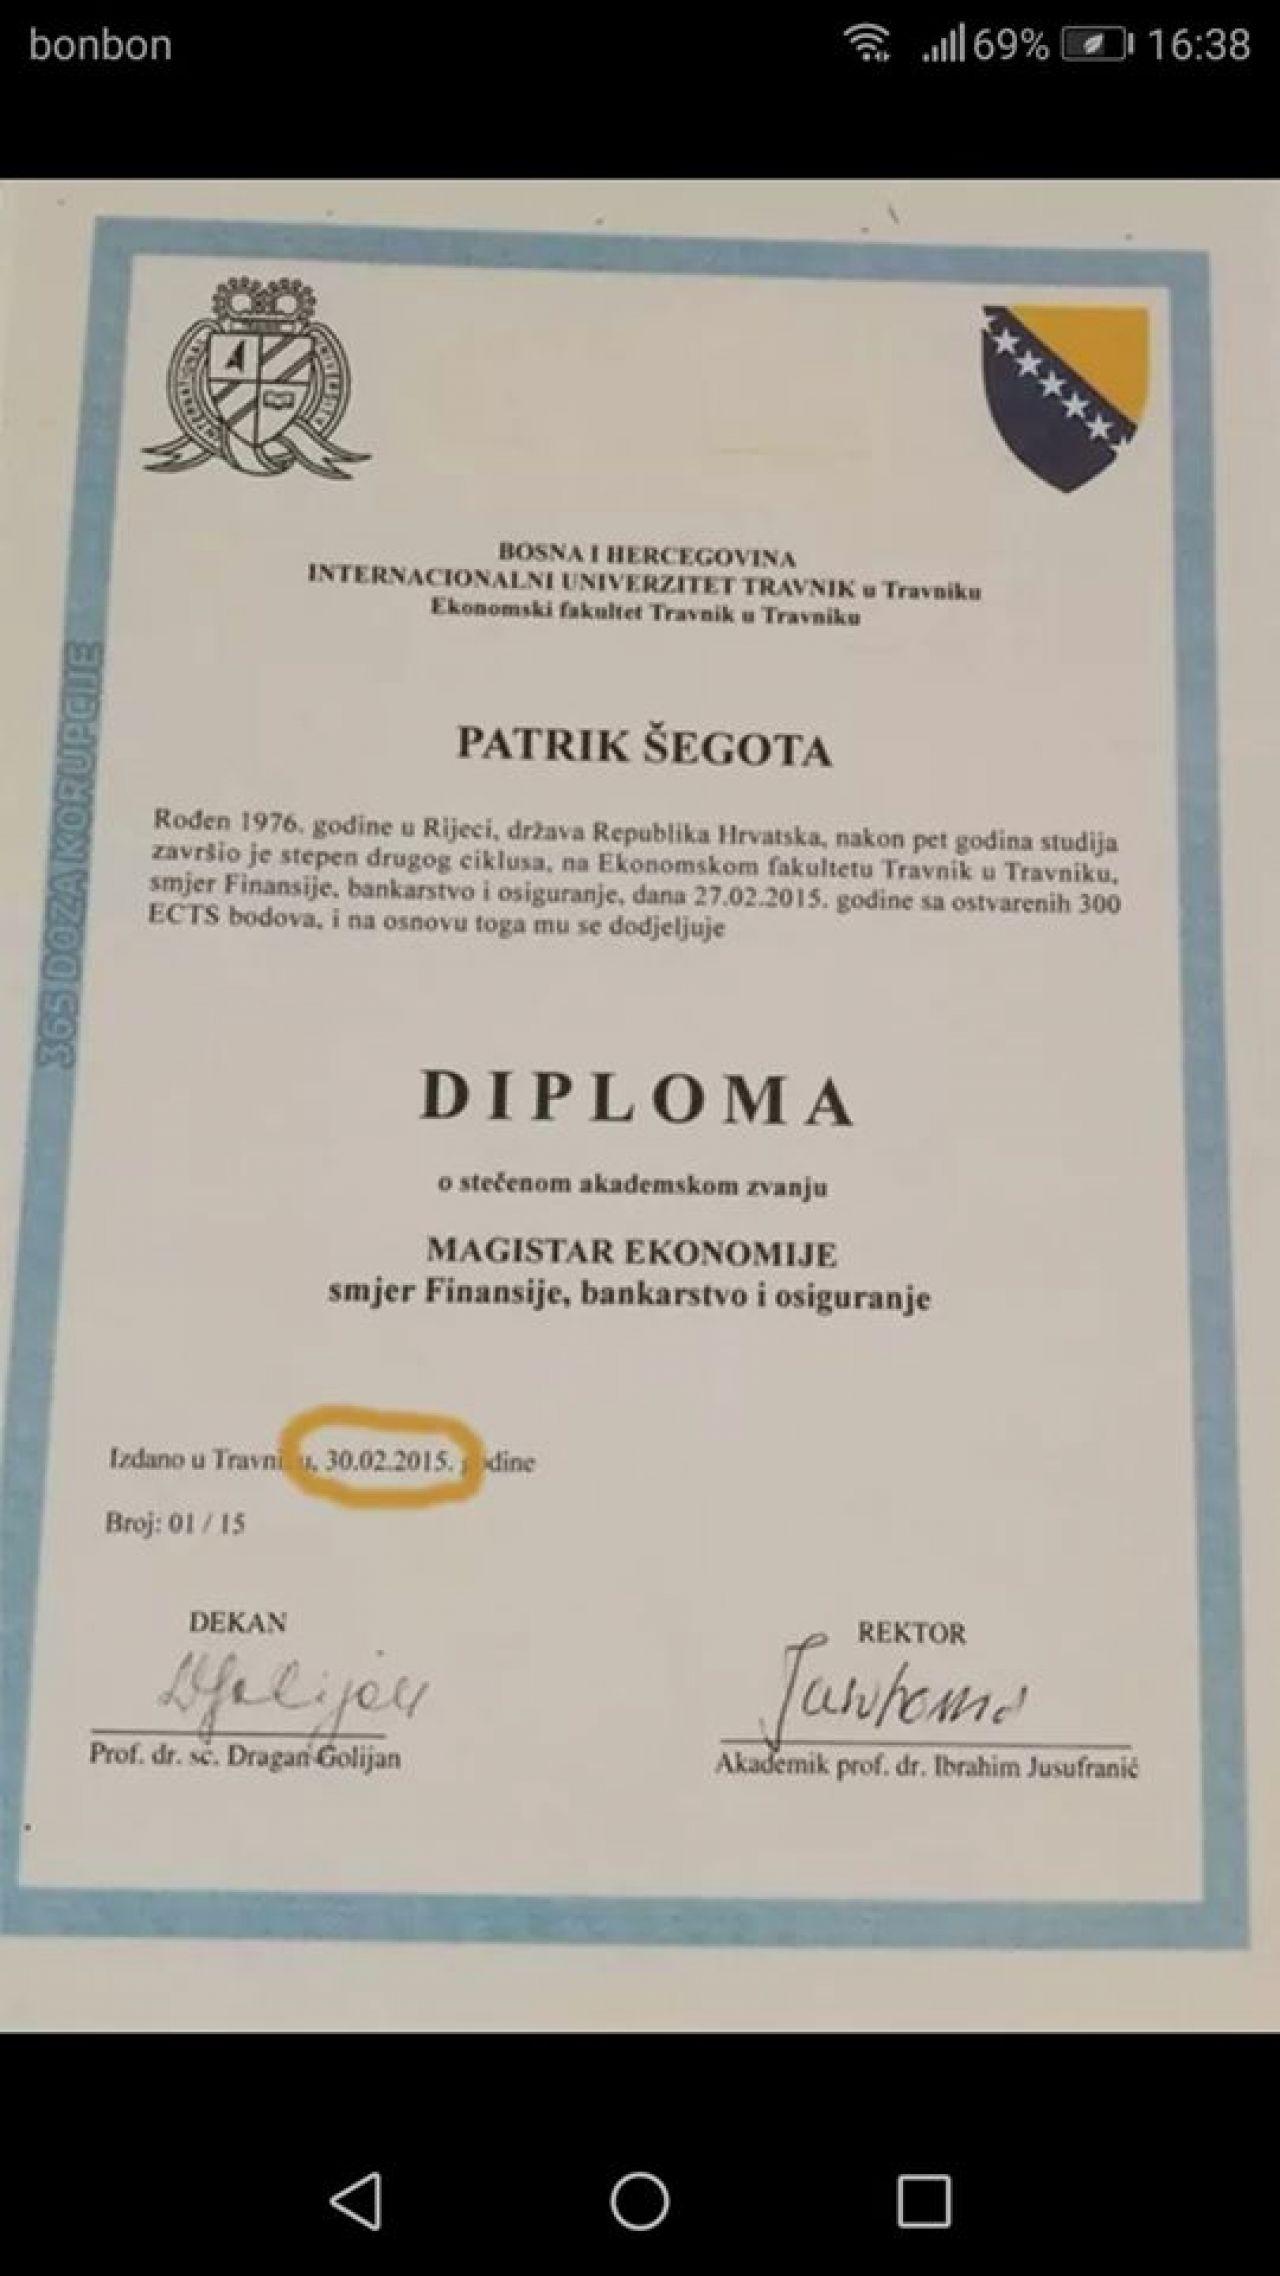 diploma-2_2.jpg